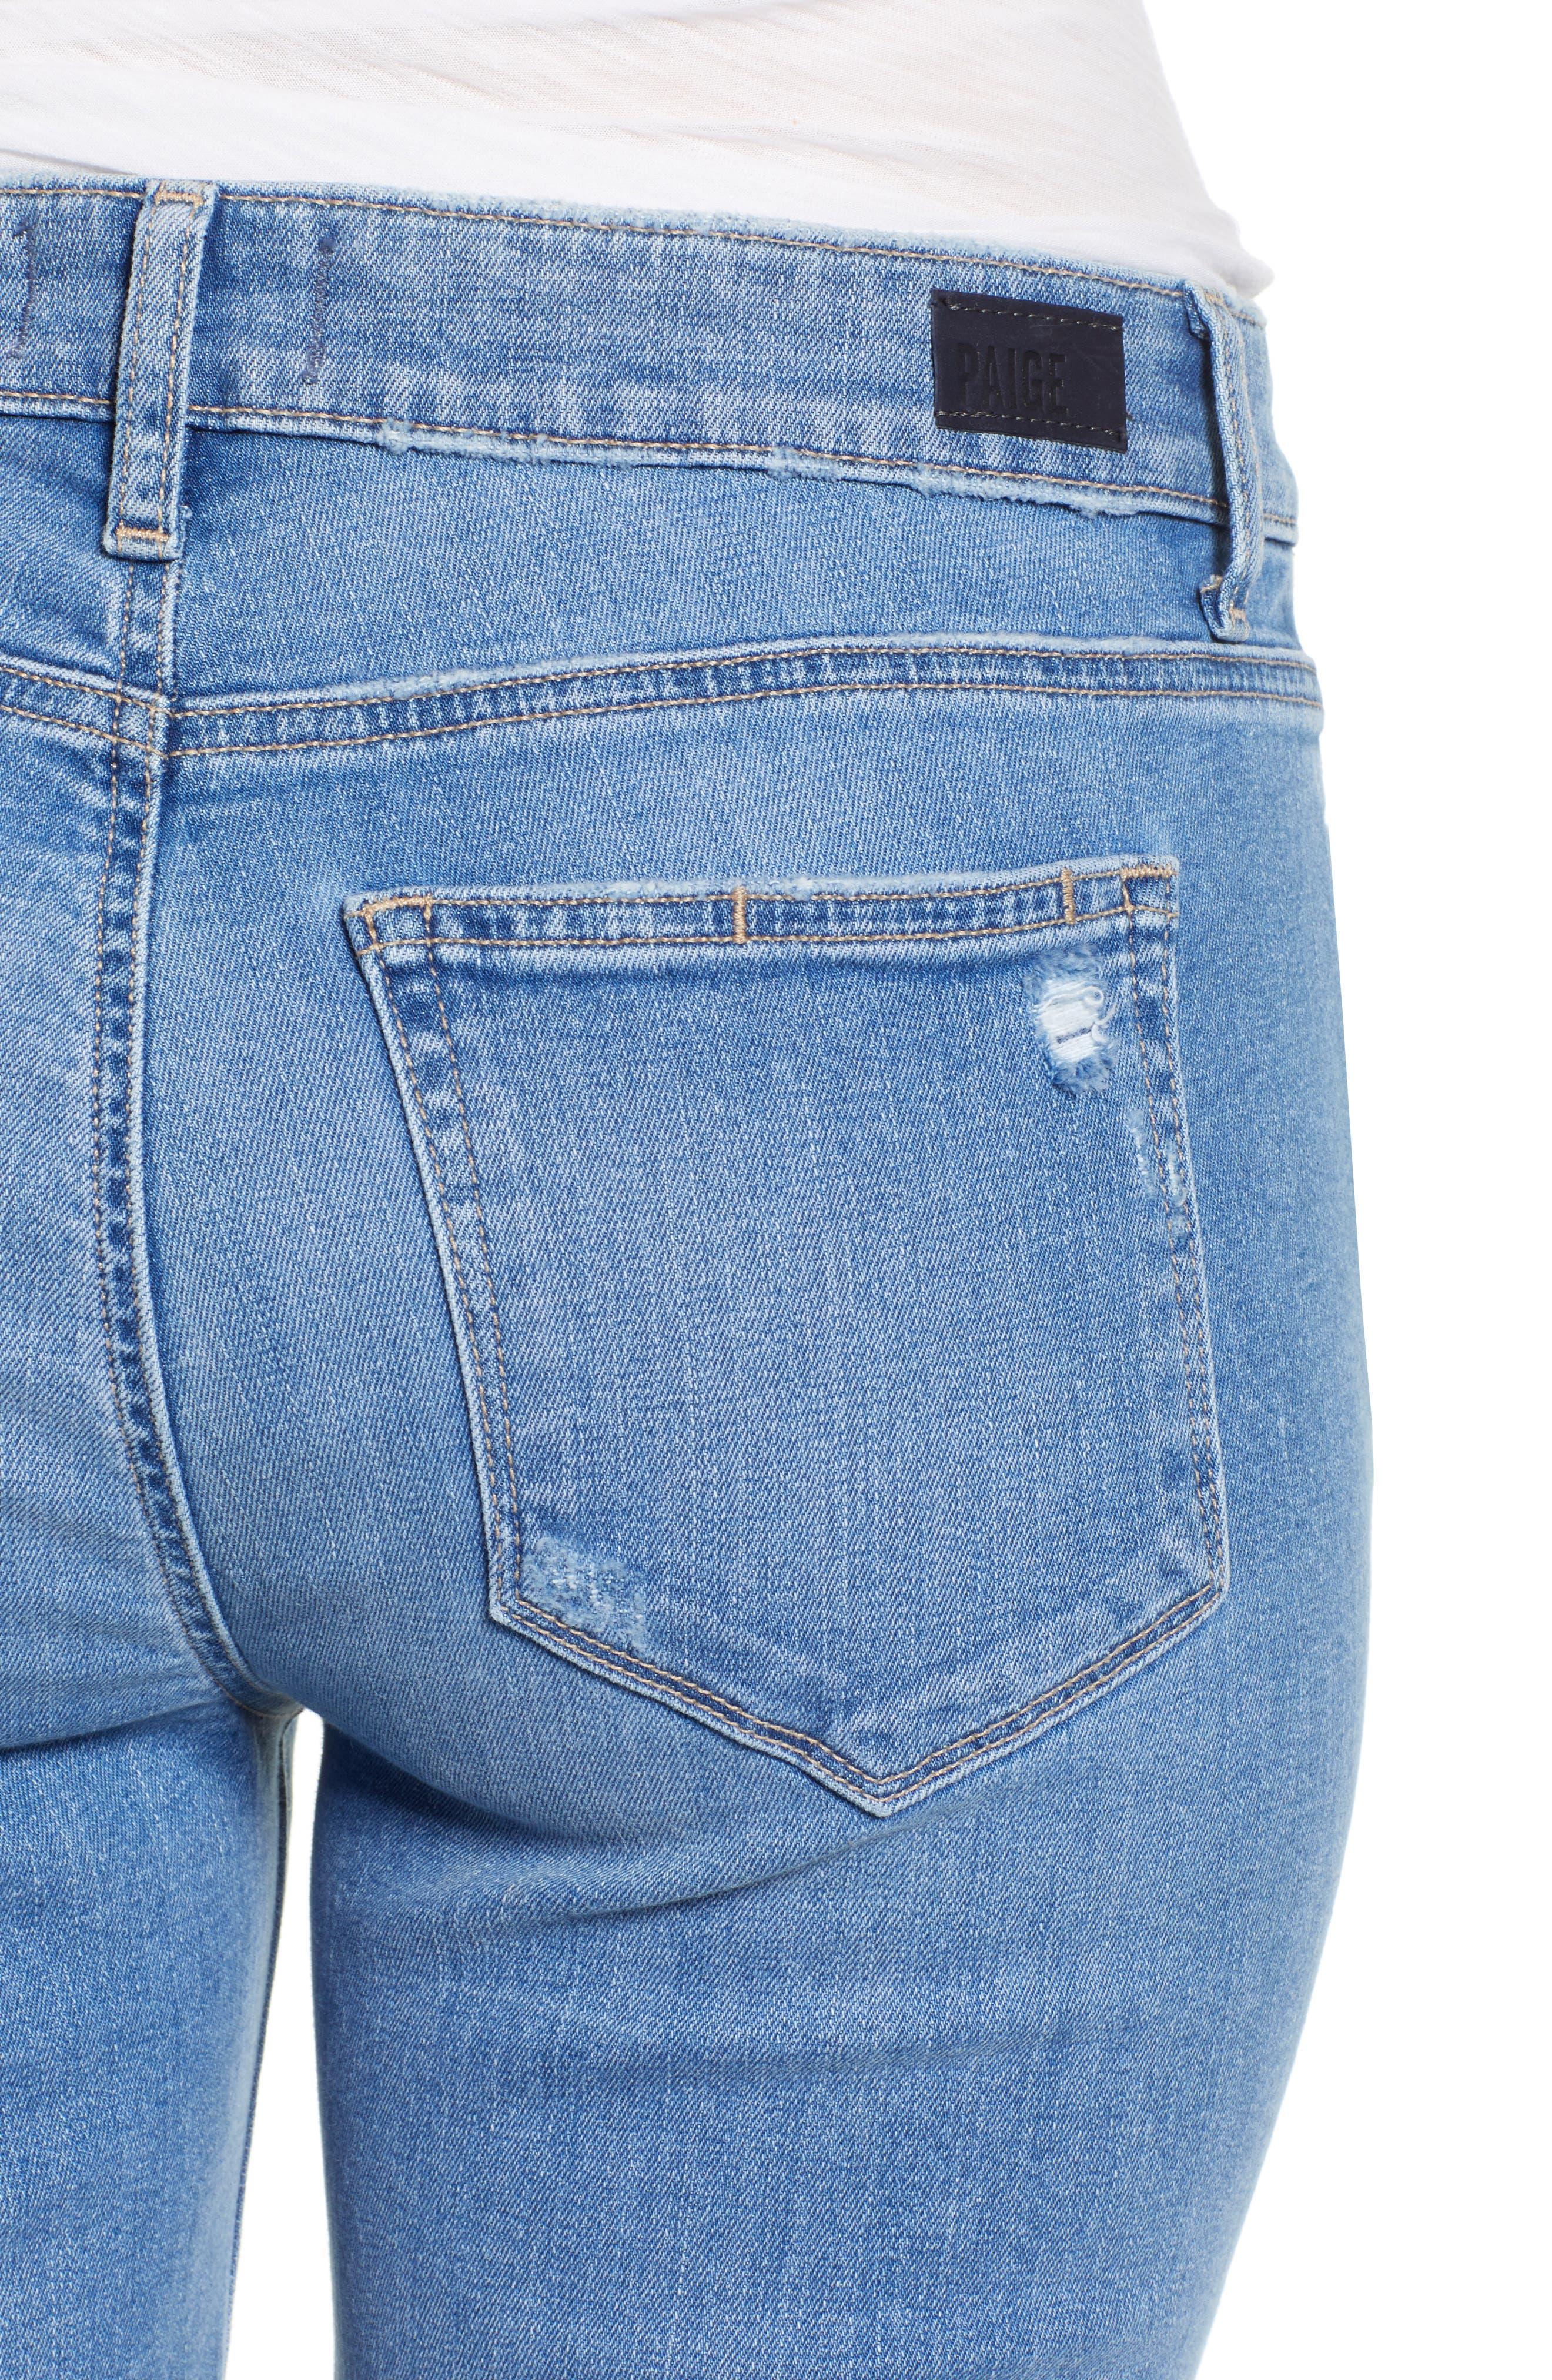 Transcend Vintage - Jimmy Jimmy High Waist Crop Boyfriend Jeans,                             Alternate thumbnail 4, color,                             Vintage Venice